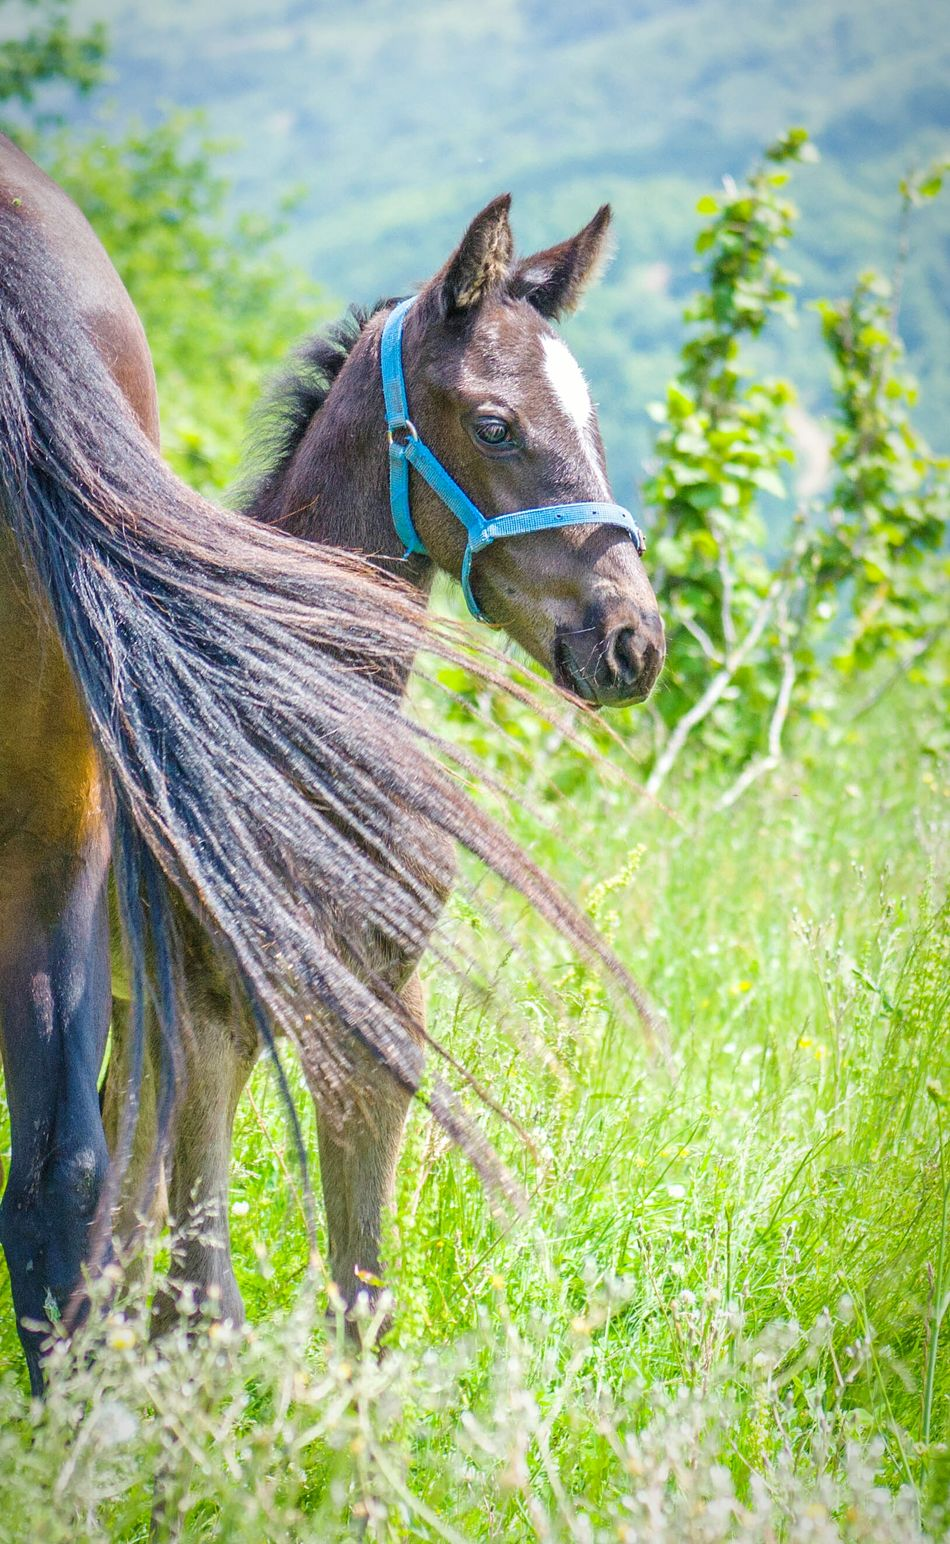 Mini Horse Horses Horse Photography  Green World Nature Nature Photography Animal Animal Photography First Eyeem Photo